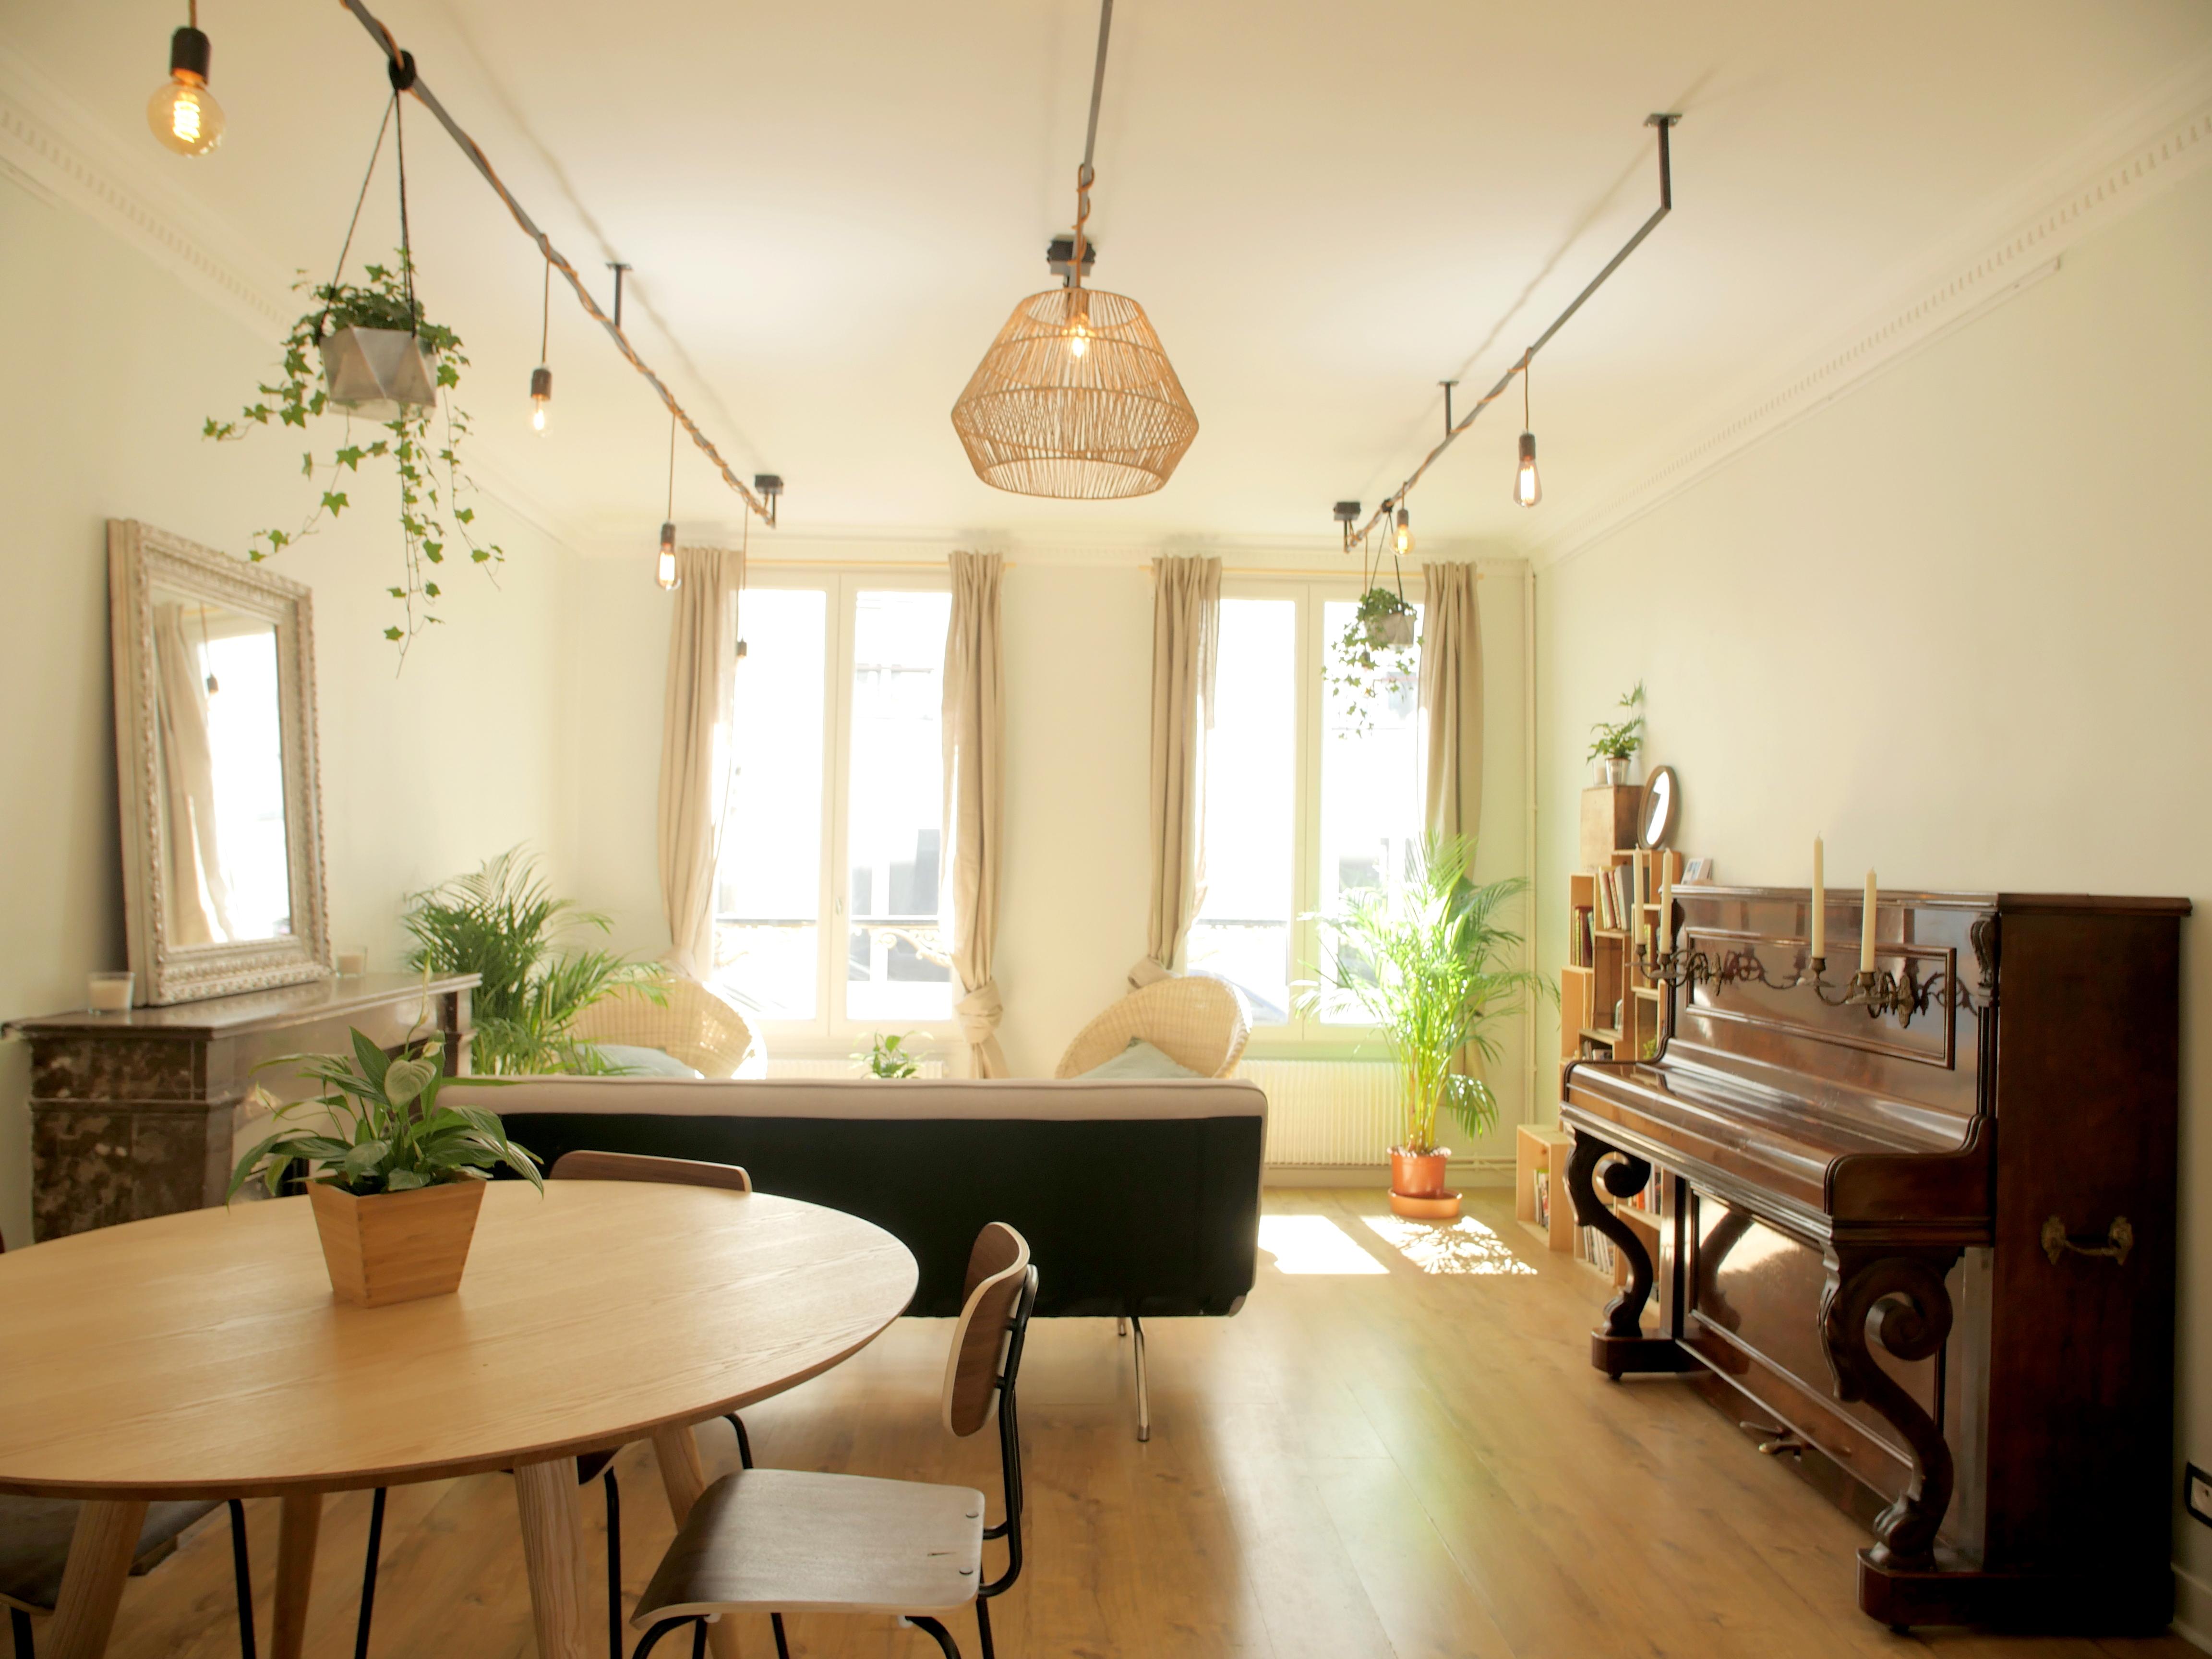 la maison muller paris spacebase. Black Bedroom Furniture Sets. Home Design Ideas